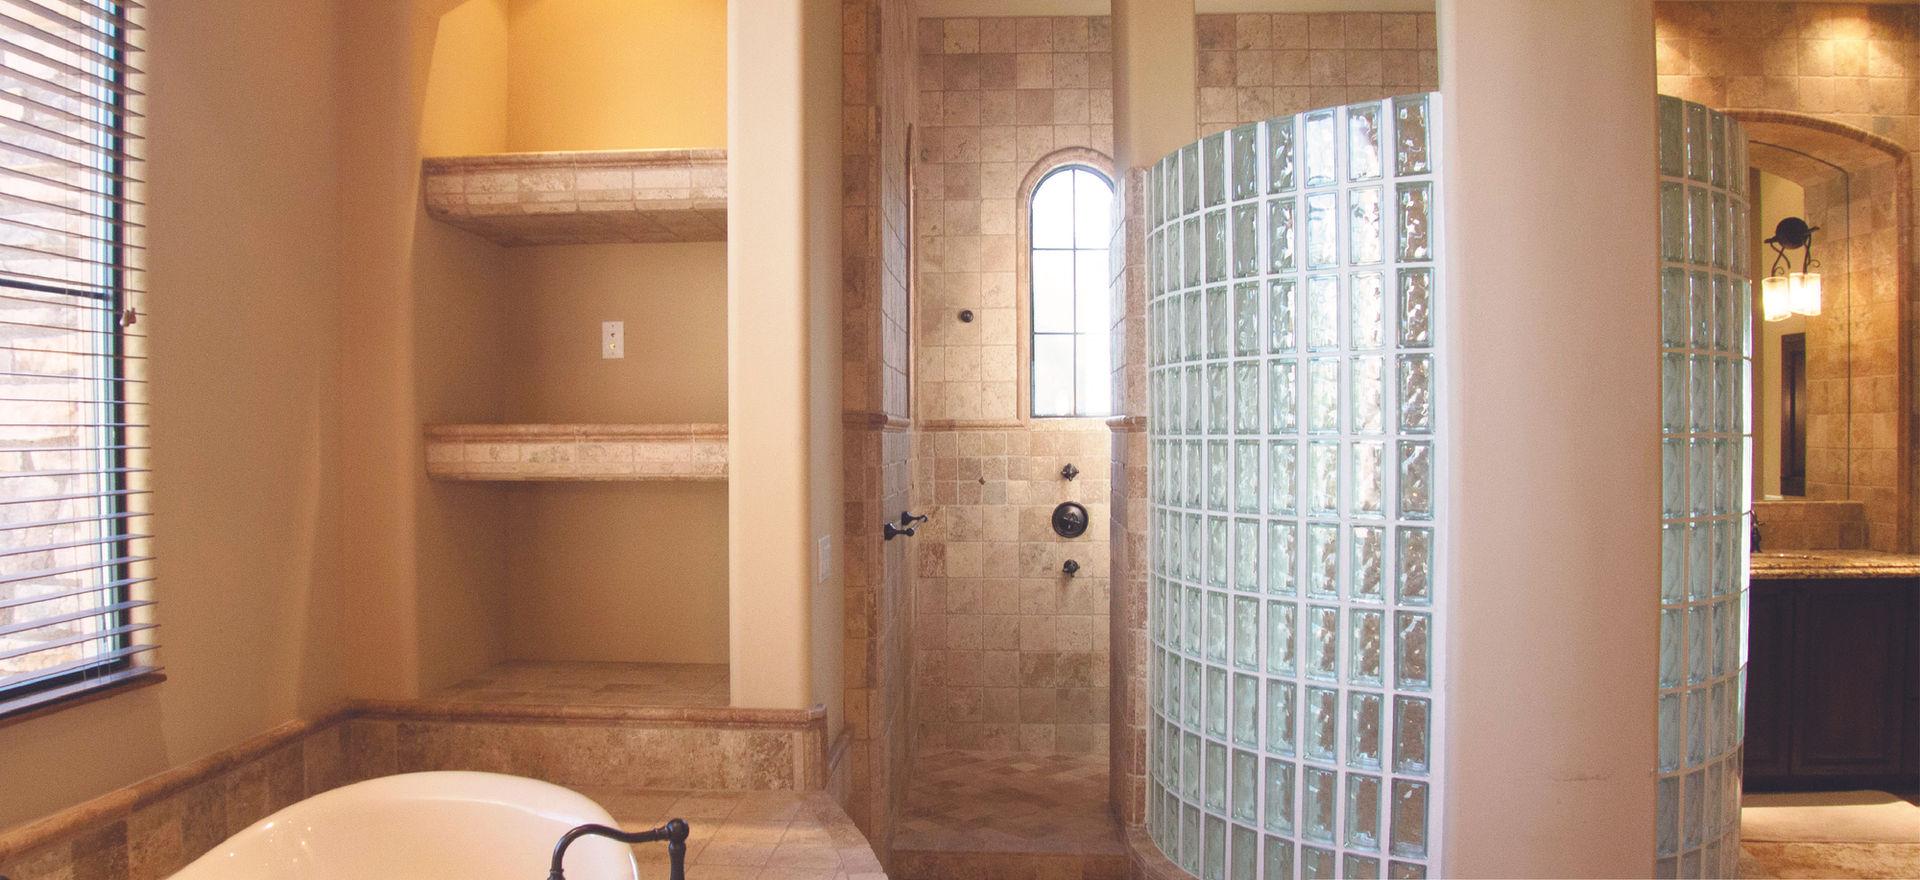 Goodbye glass block shower.